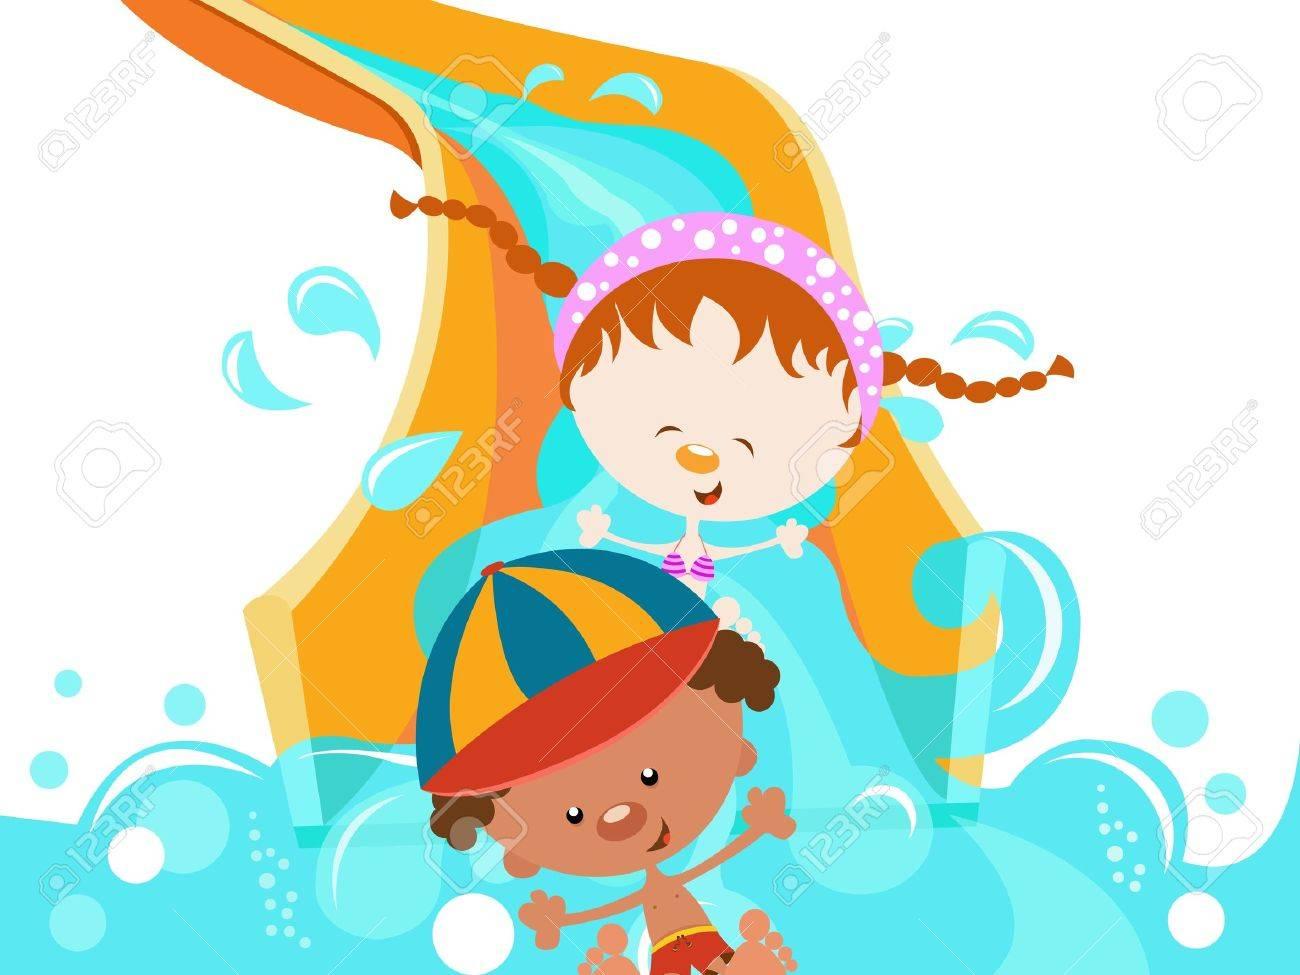 Kids On Water Slide Stock Vector - 11602228